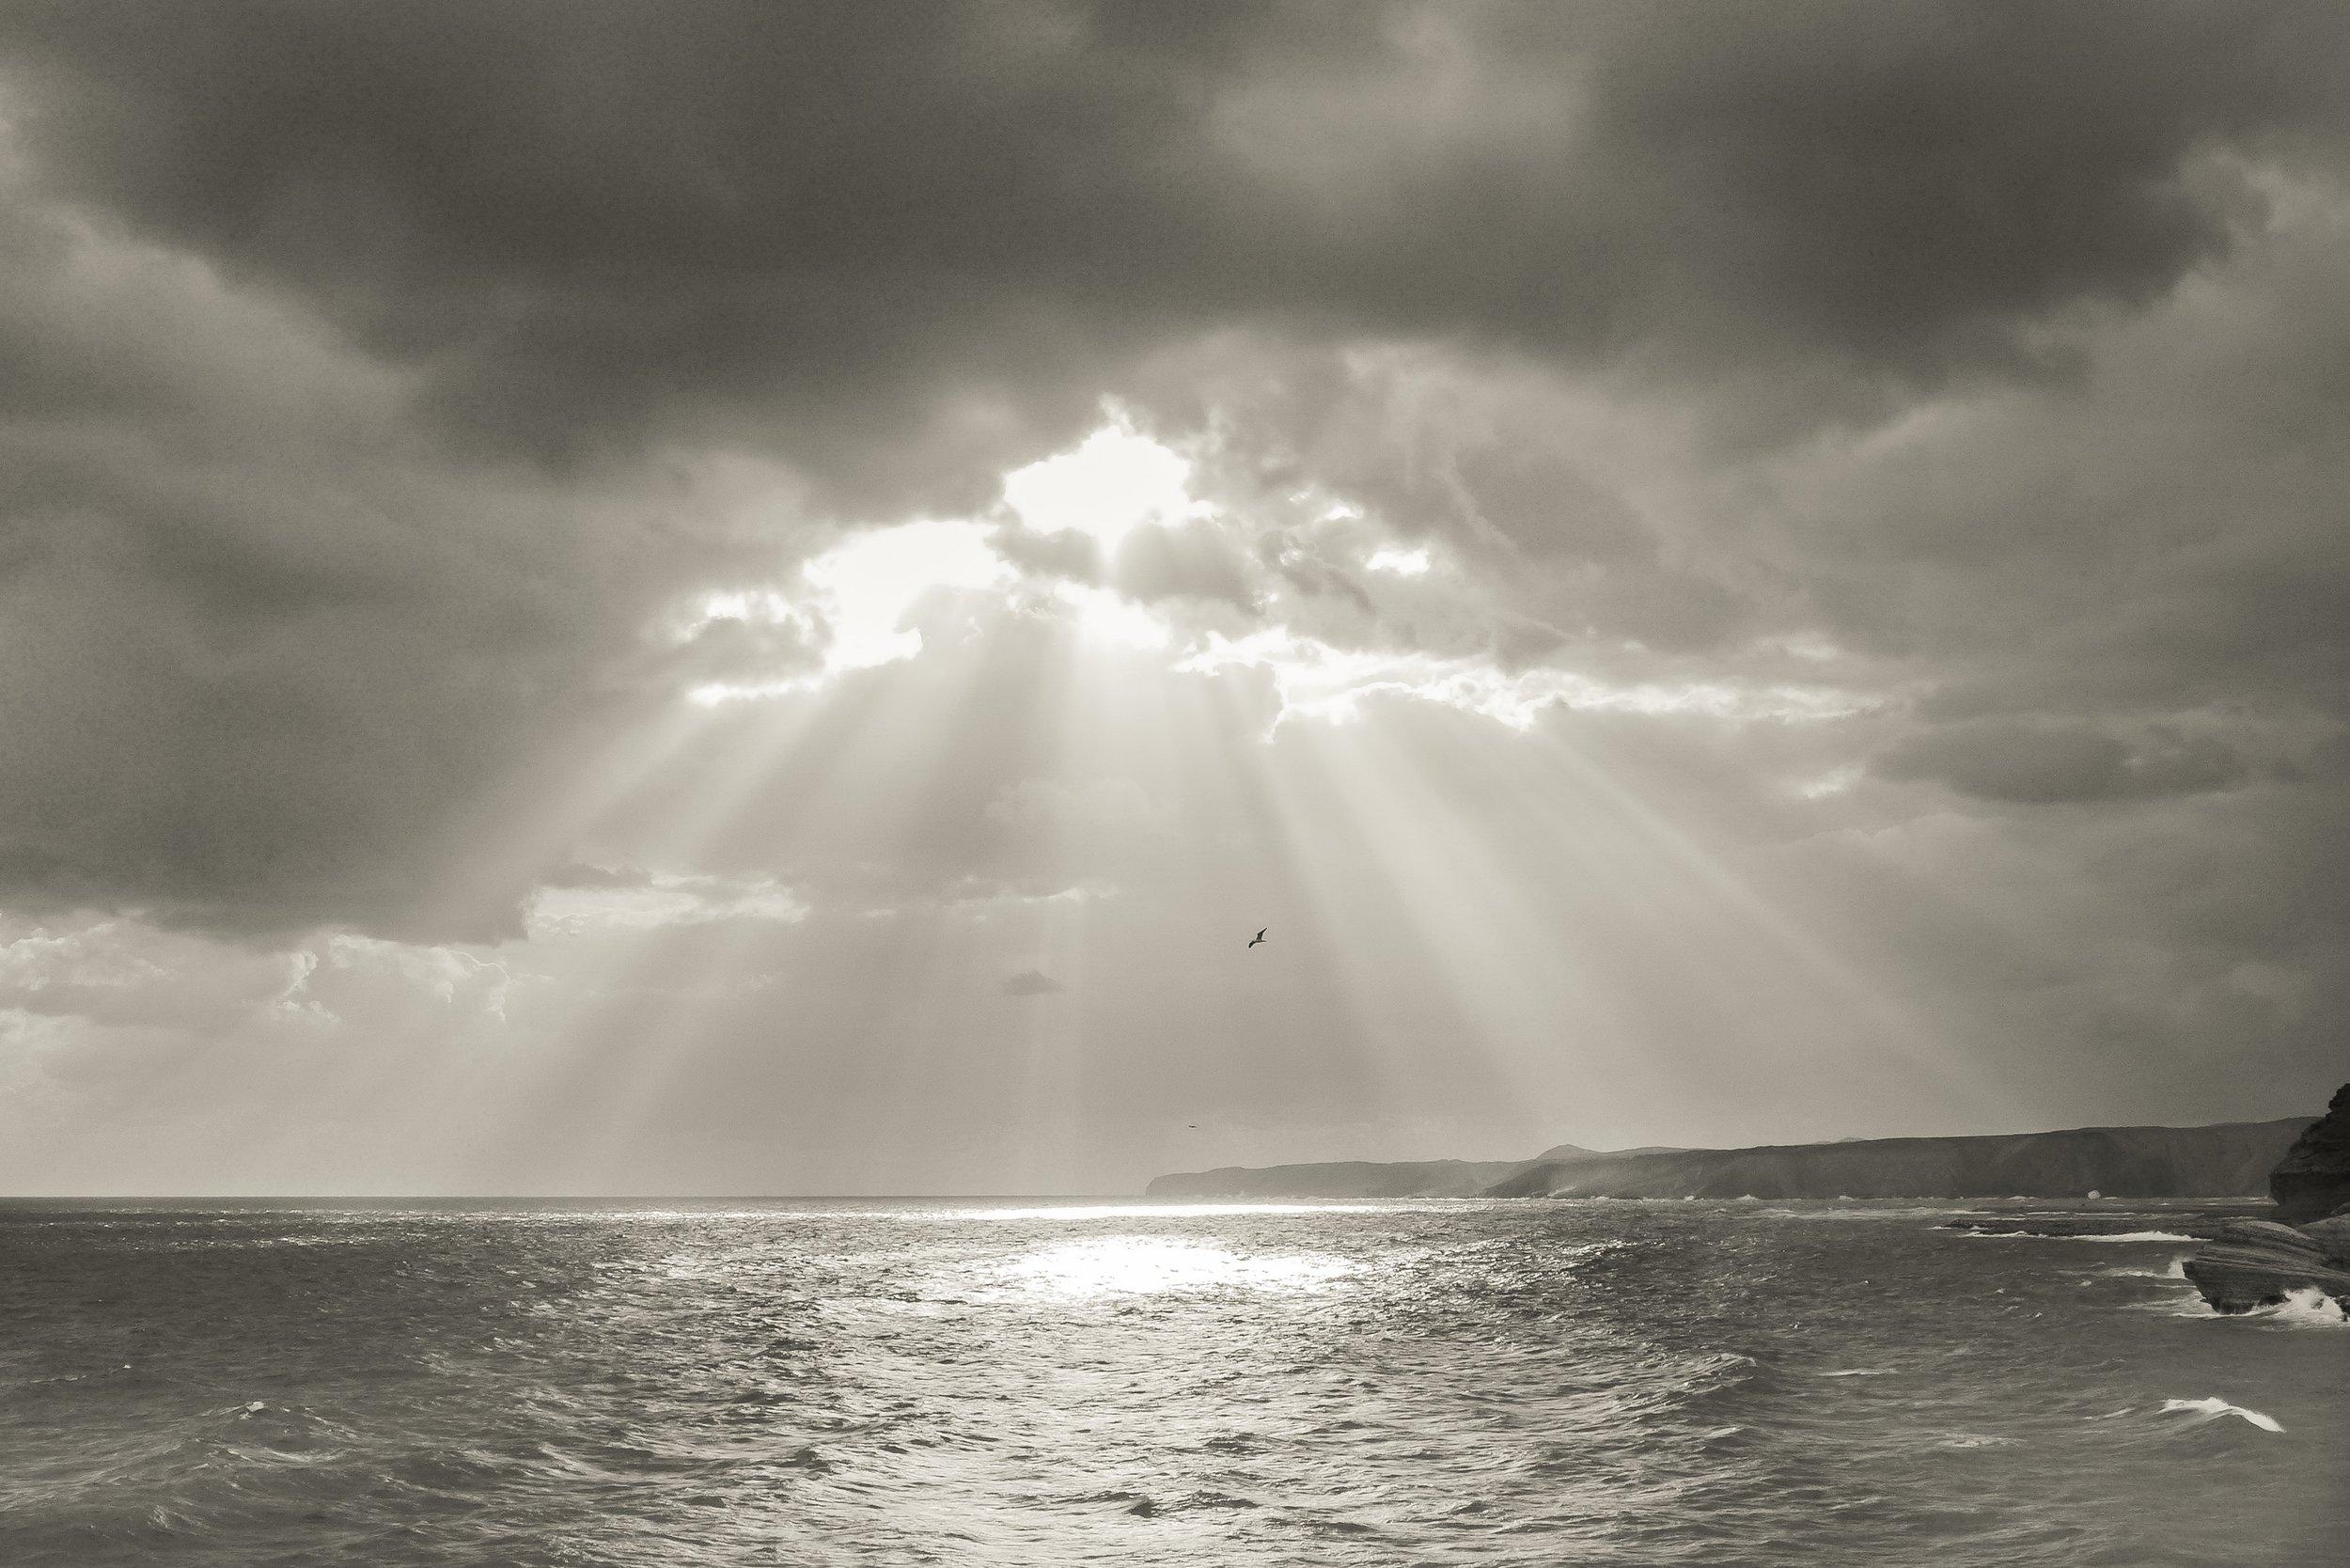 Nantucket Sound, MA